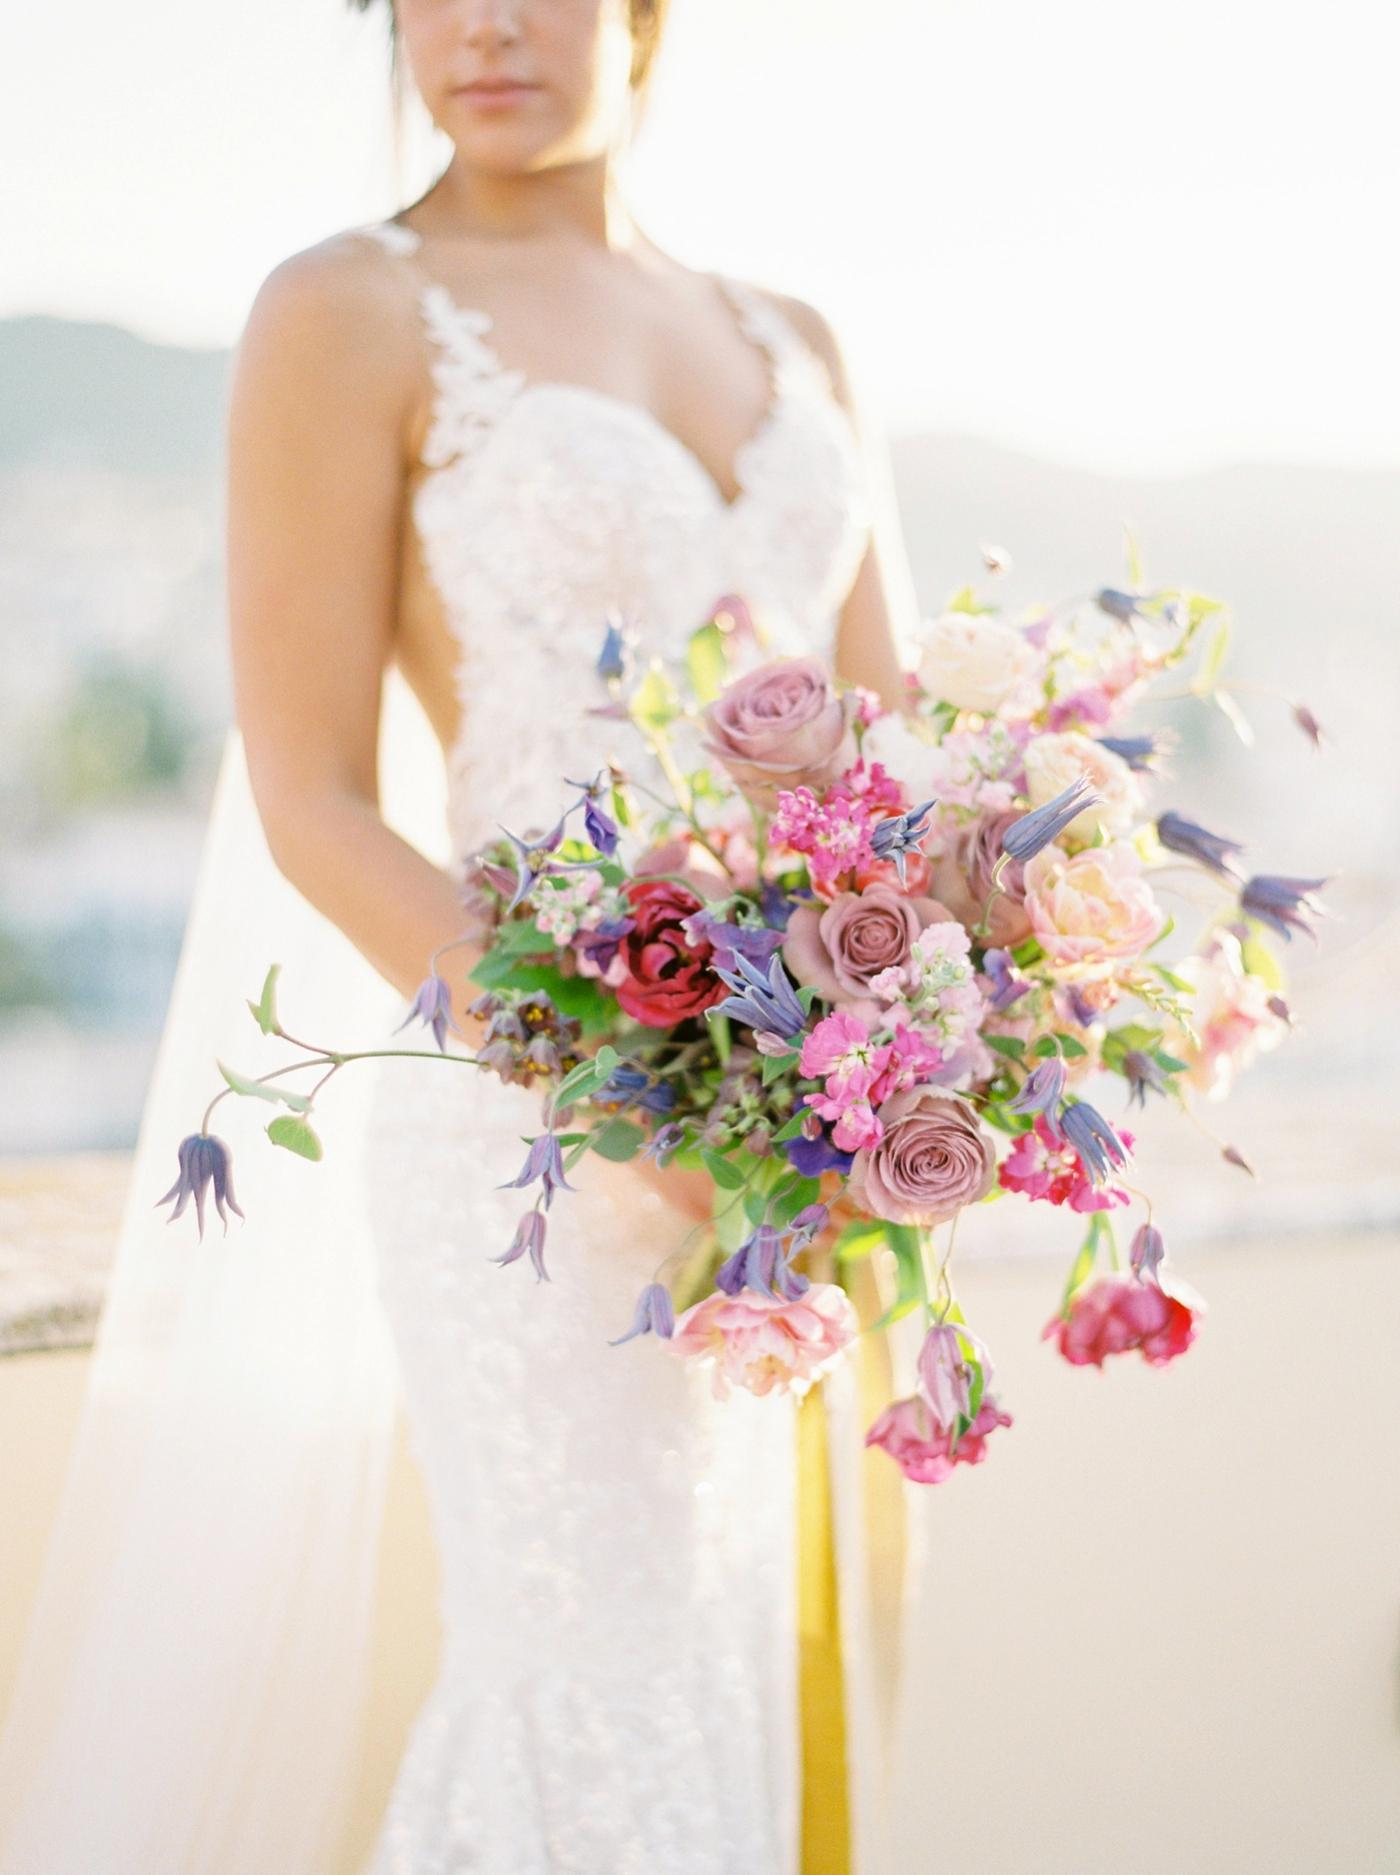 Spetses greece destination wedding photographer | Poseidonion Grand Hotel Wedding | Justine Milton fine art film photography | black and colorful glamorous wedding inspiration